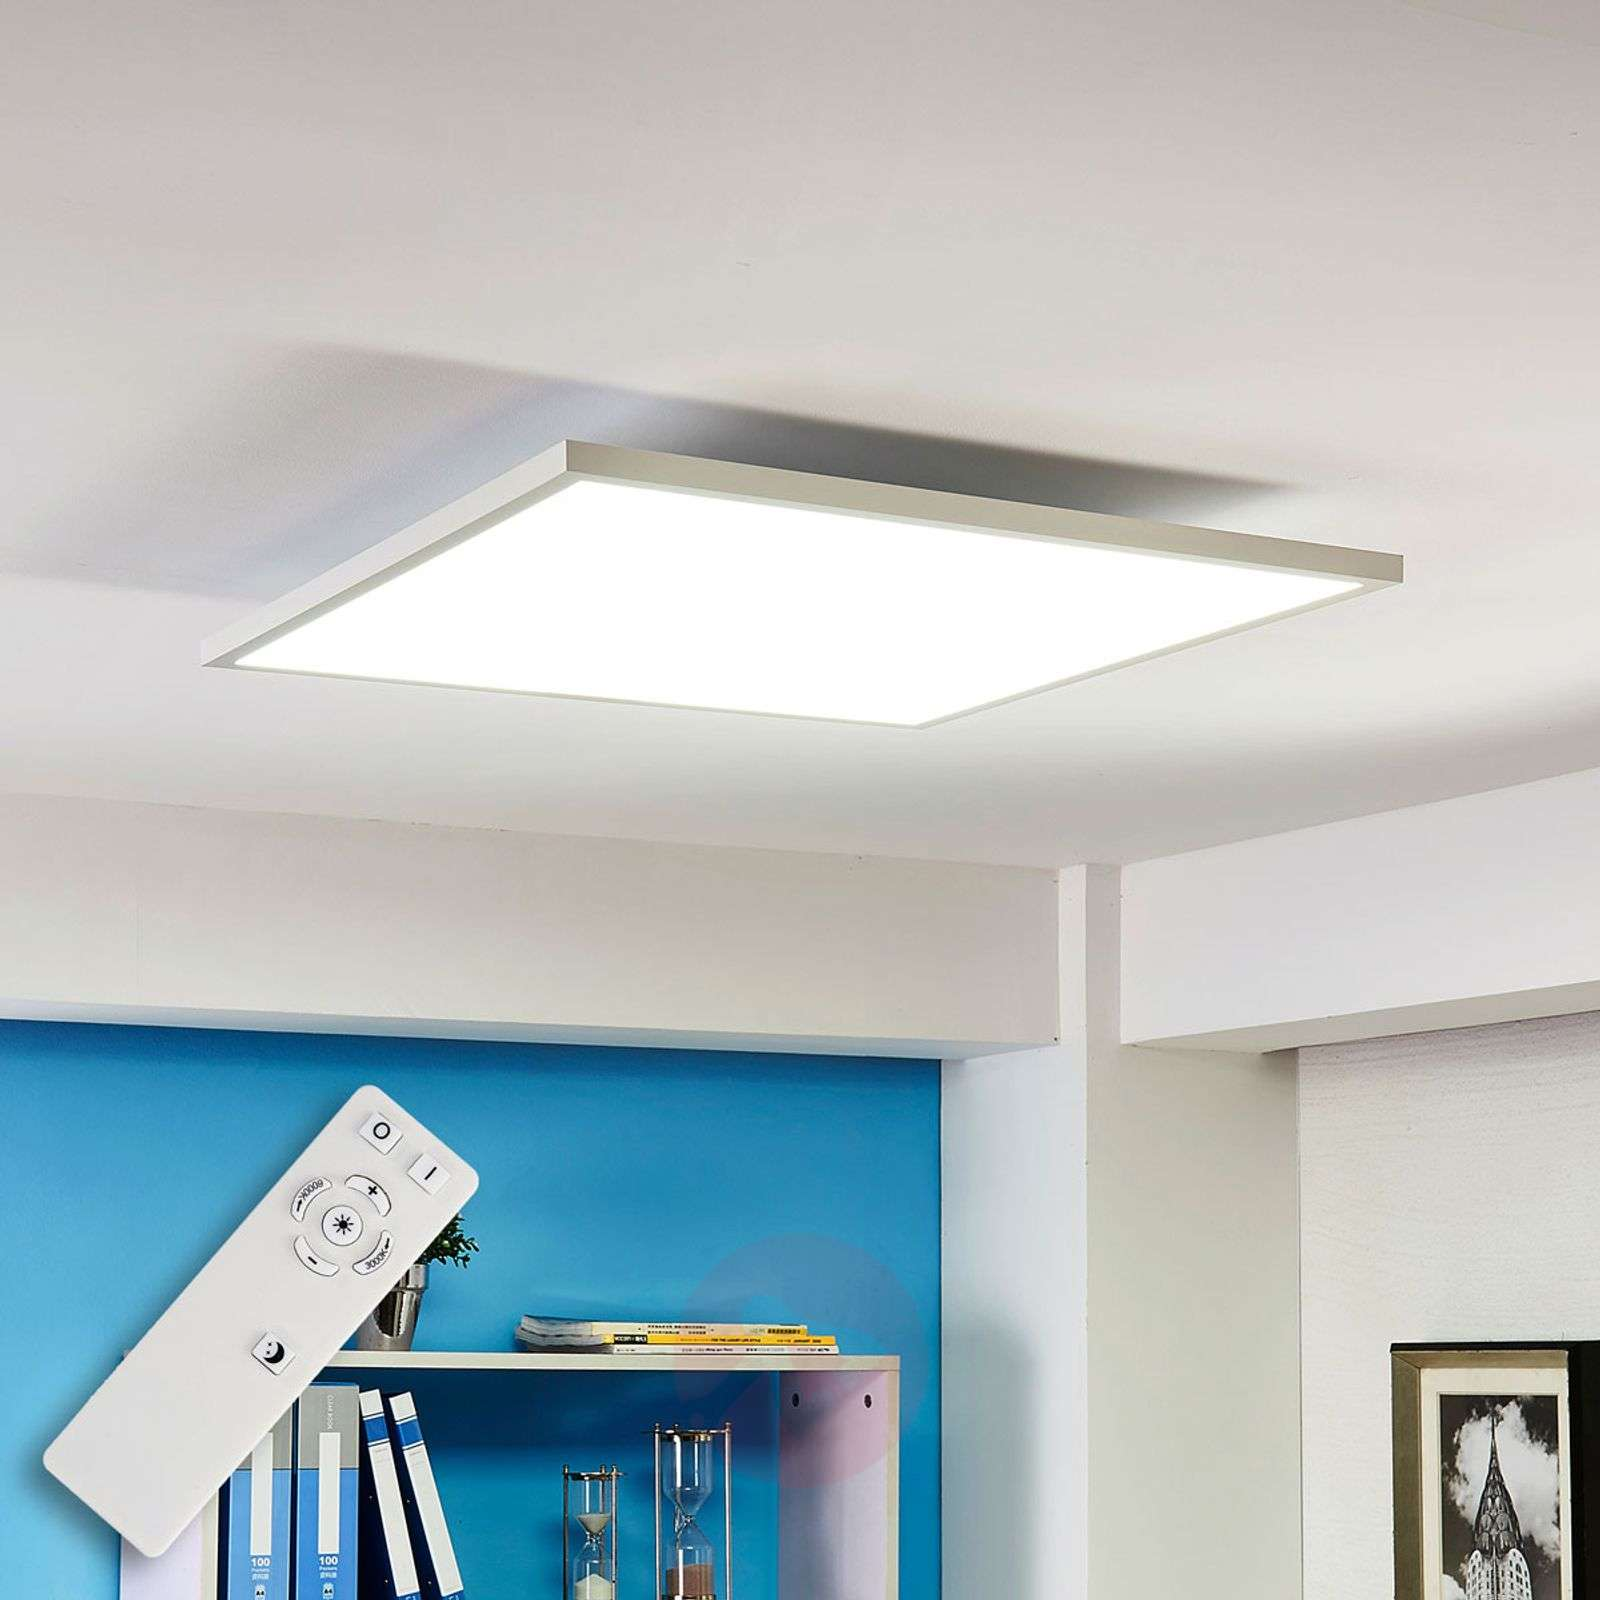 Adj. luminous colour LED panel Philia, 59.5 cm-9621214-011